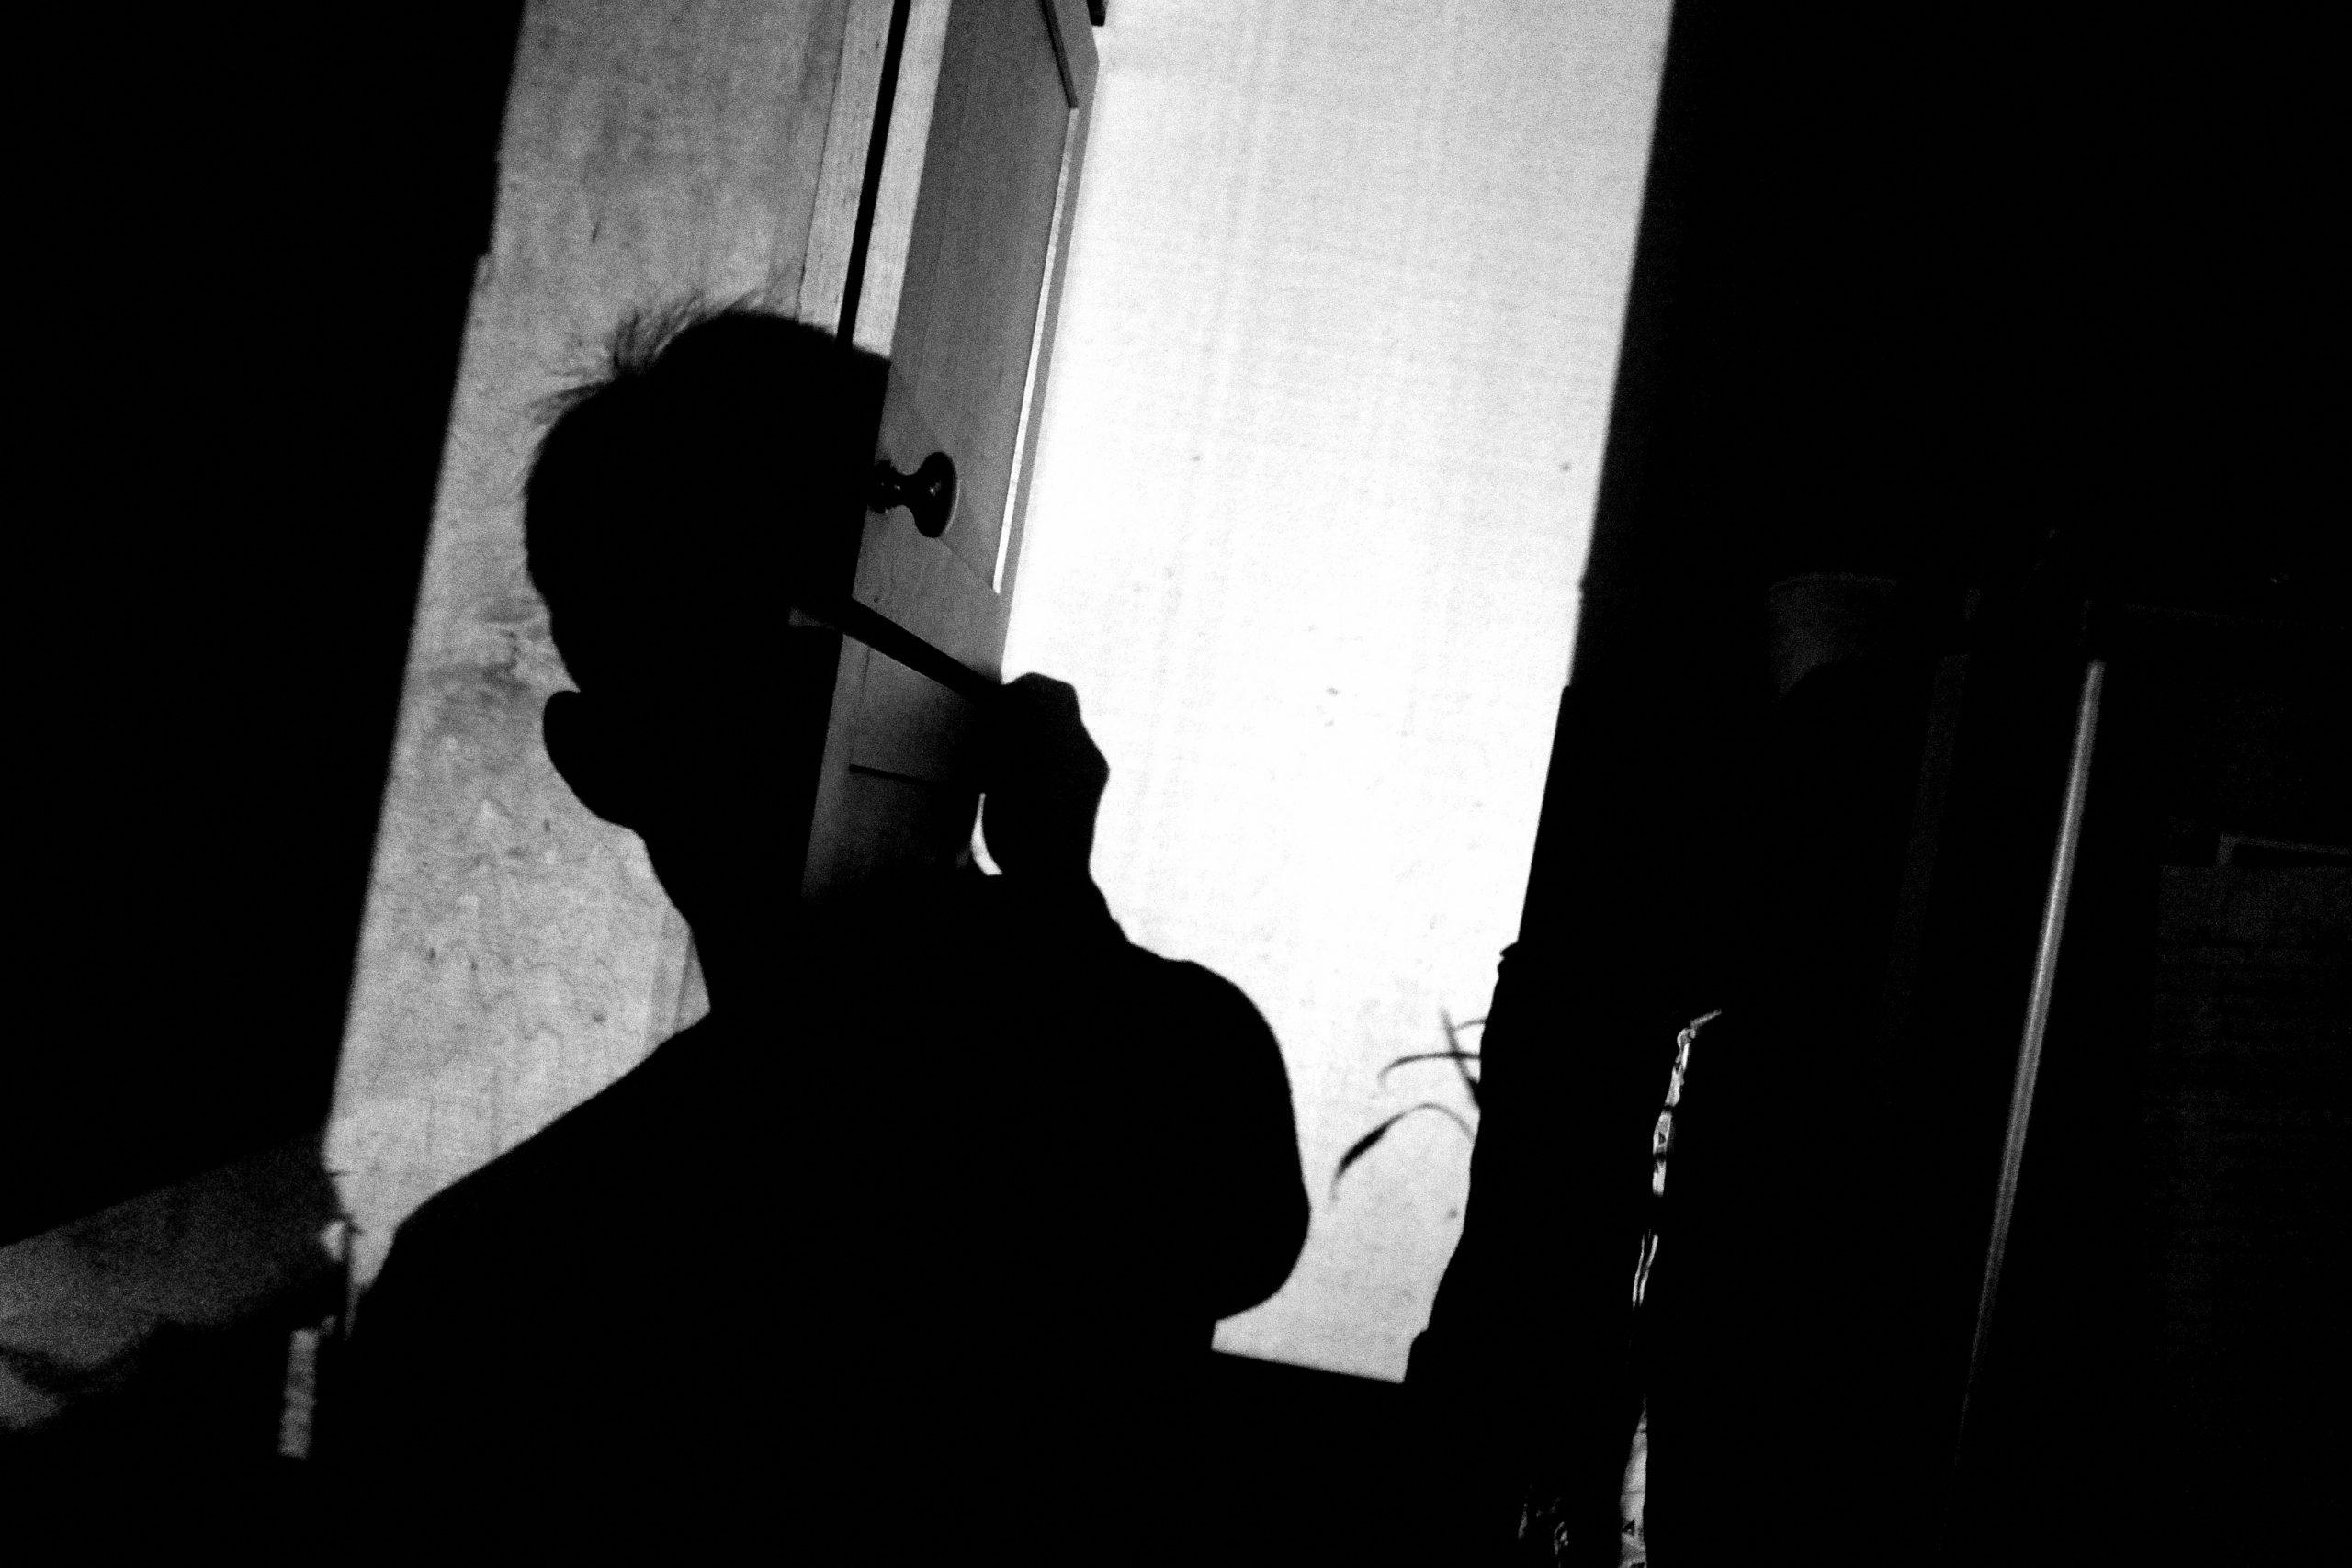 selfie shadow ERIC KIM